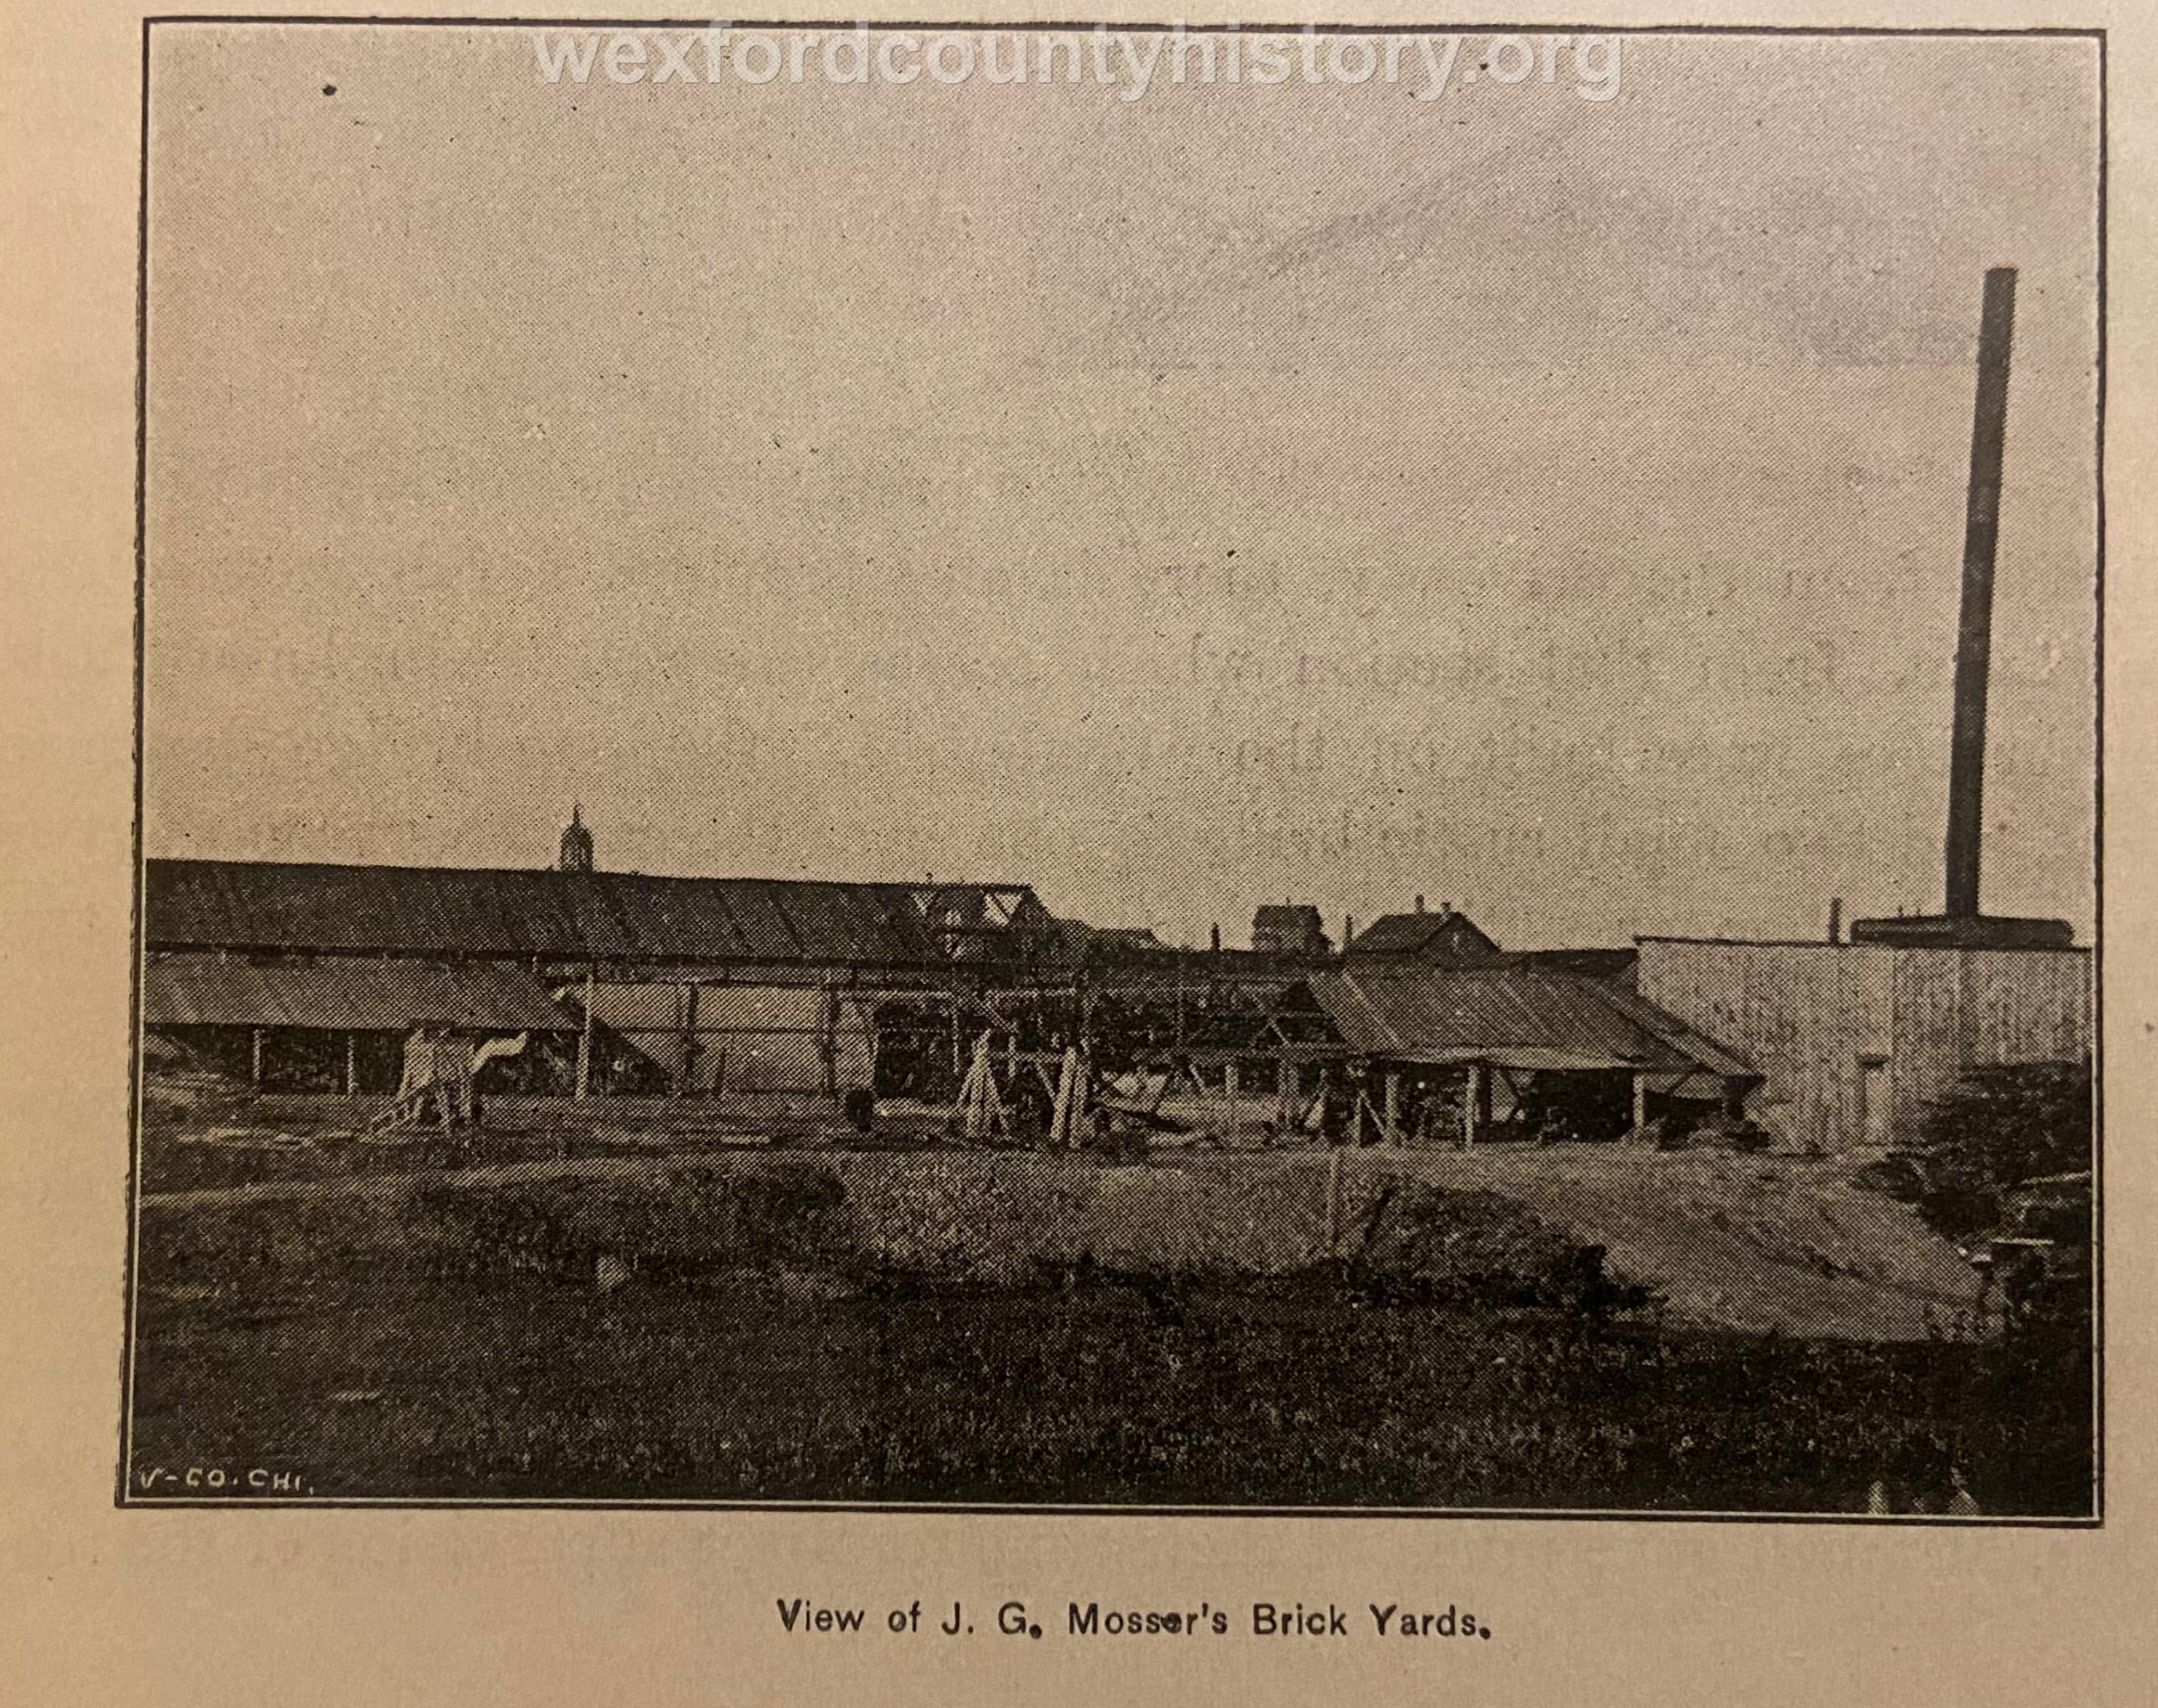 J. G. Mosser's Brick Yard